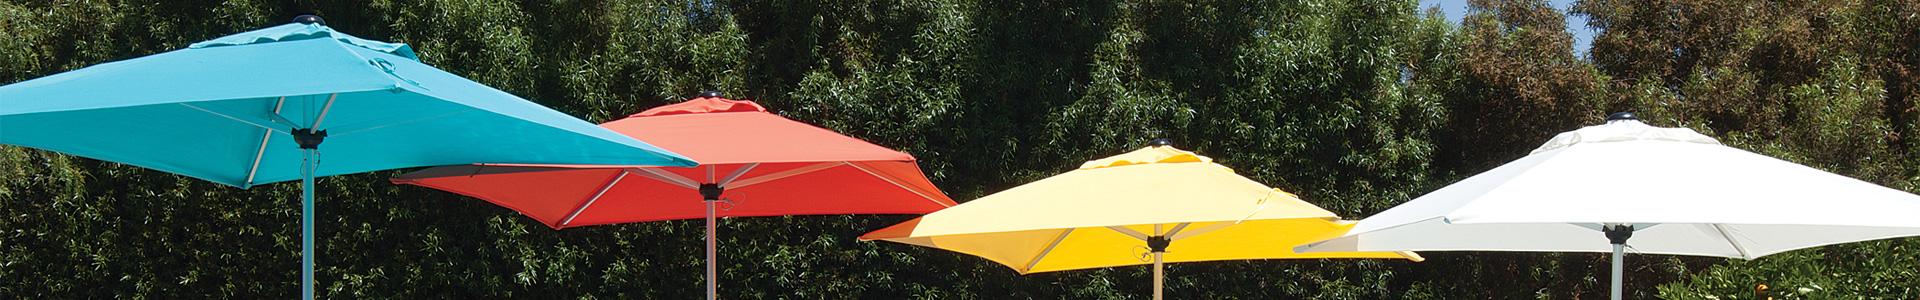 Auto Tilt Market Umbrellas